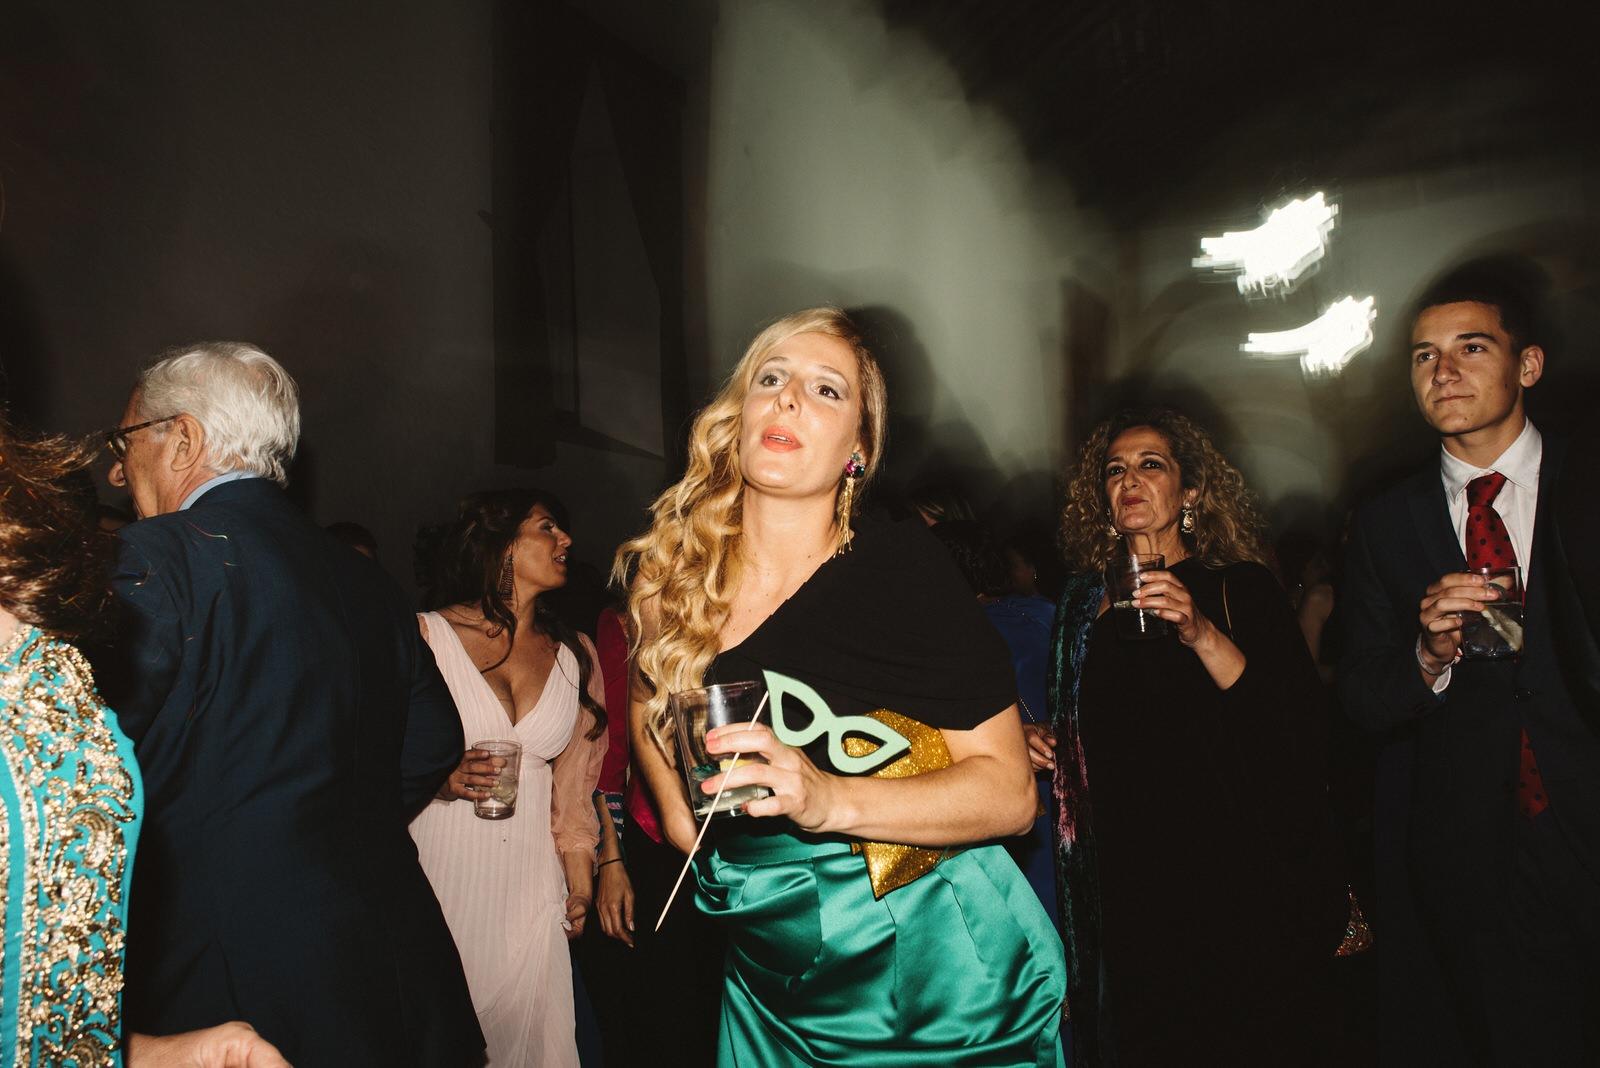 fotografo de bodas sevilla - fotografo boda - fotografía sevilla - Andrés AmarilloAAA_3774- fine.JPG